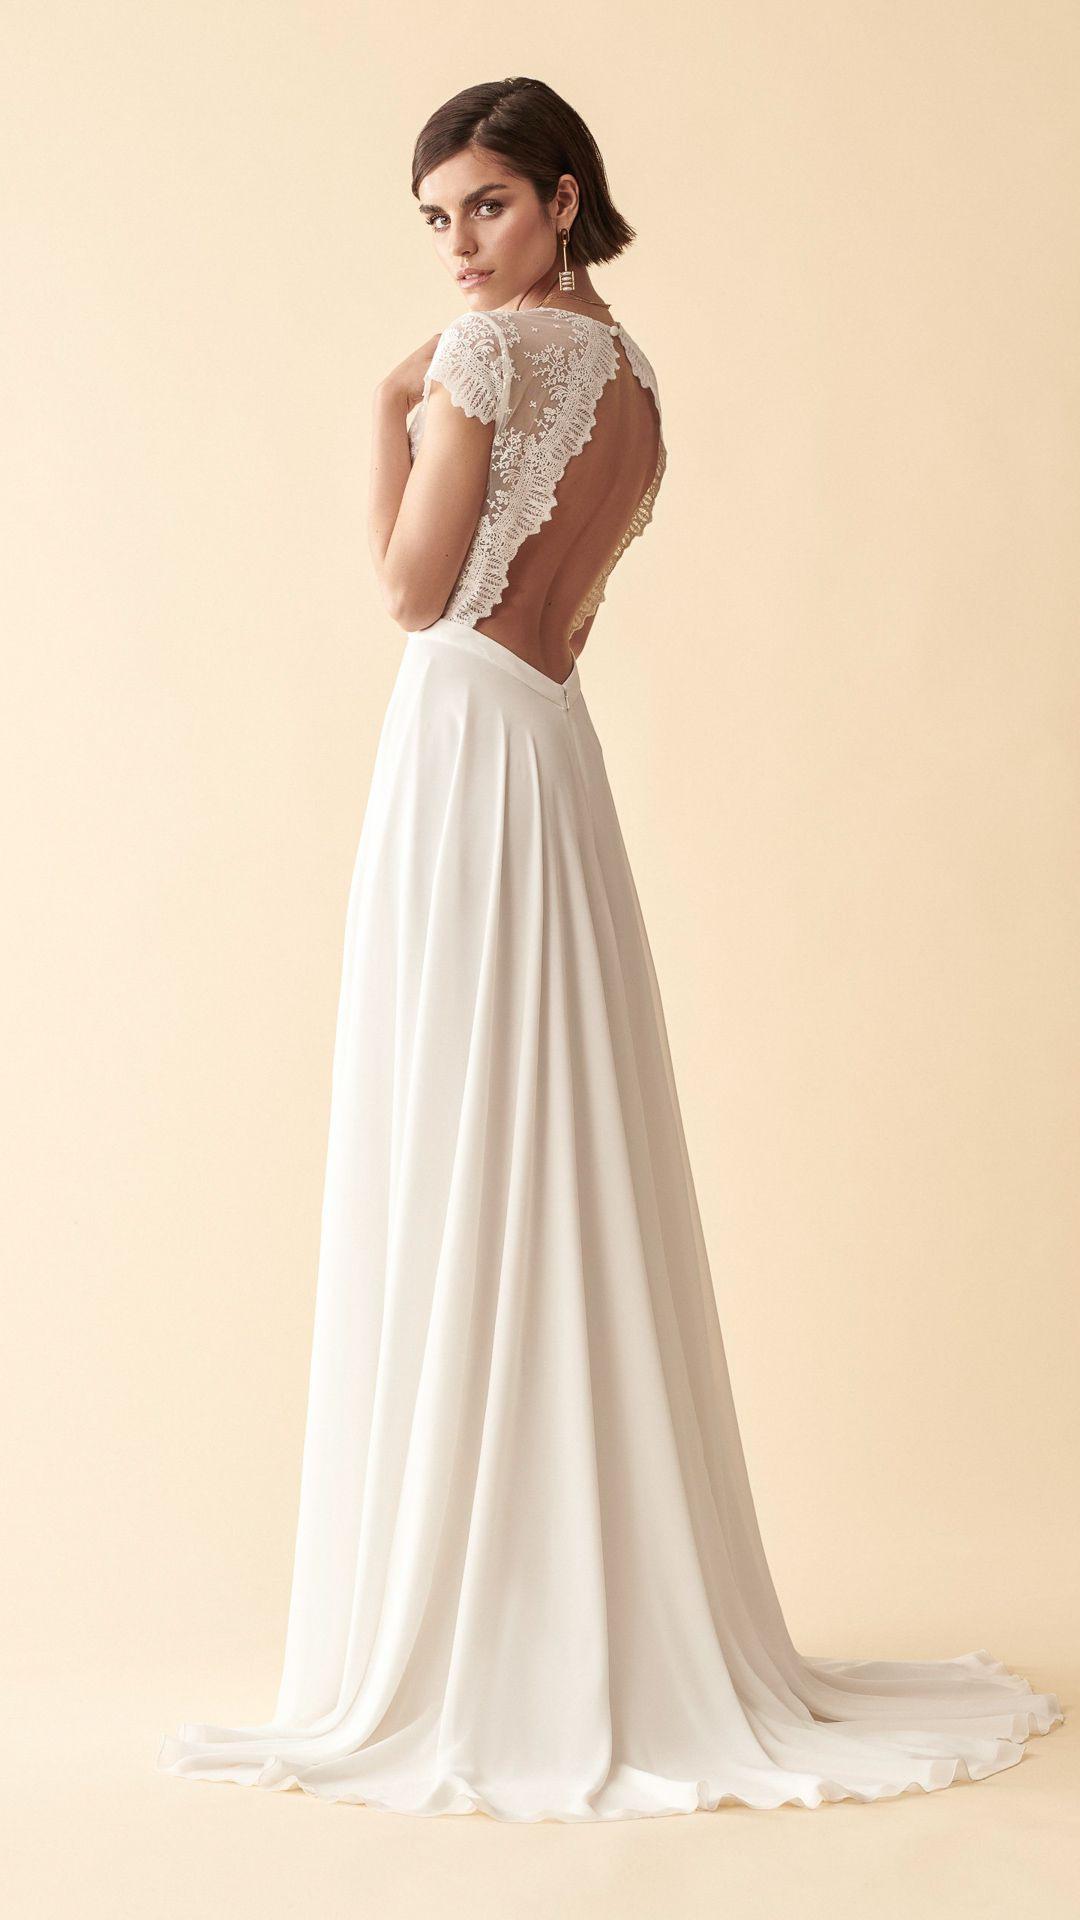 Marylise 2020  Brautkleid Kleid Hochzeit Brautkleid Vintage